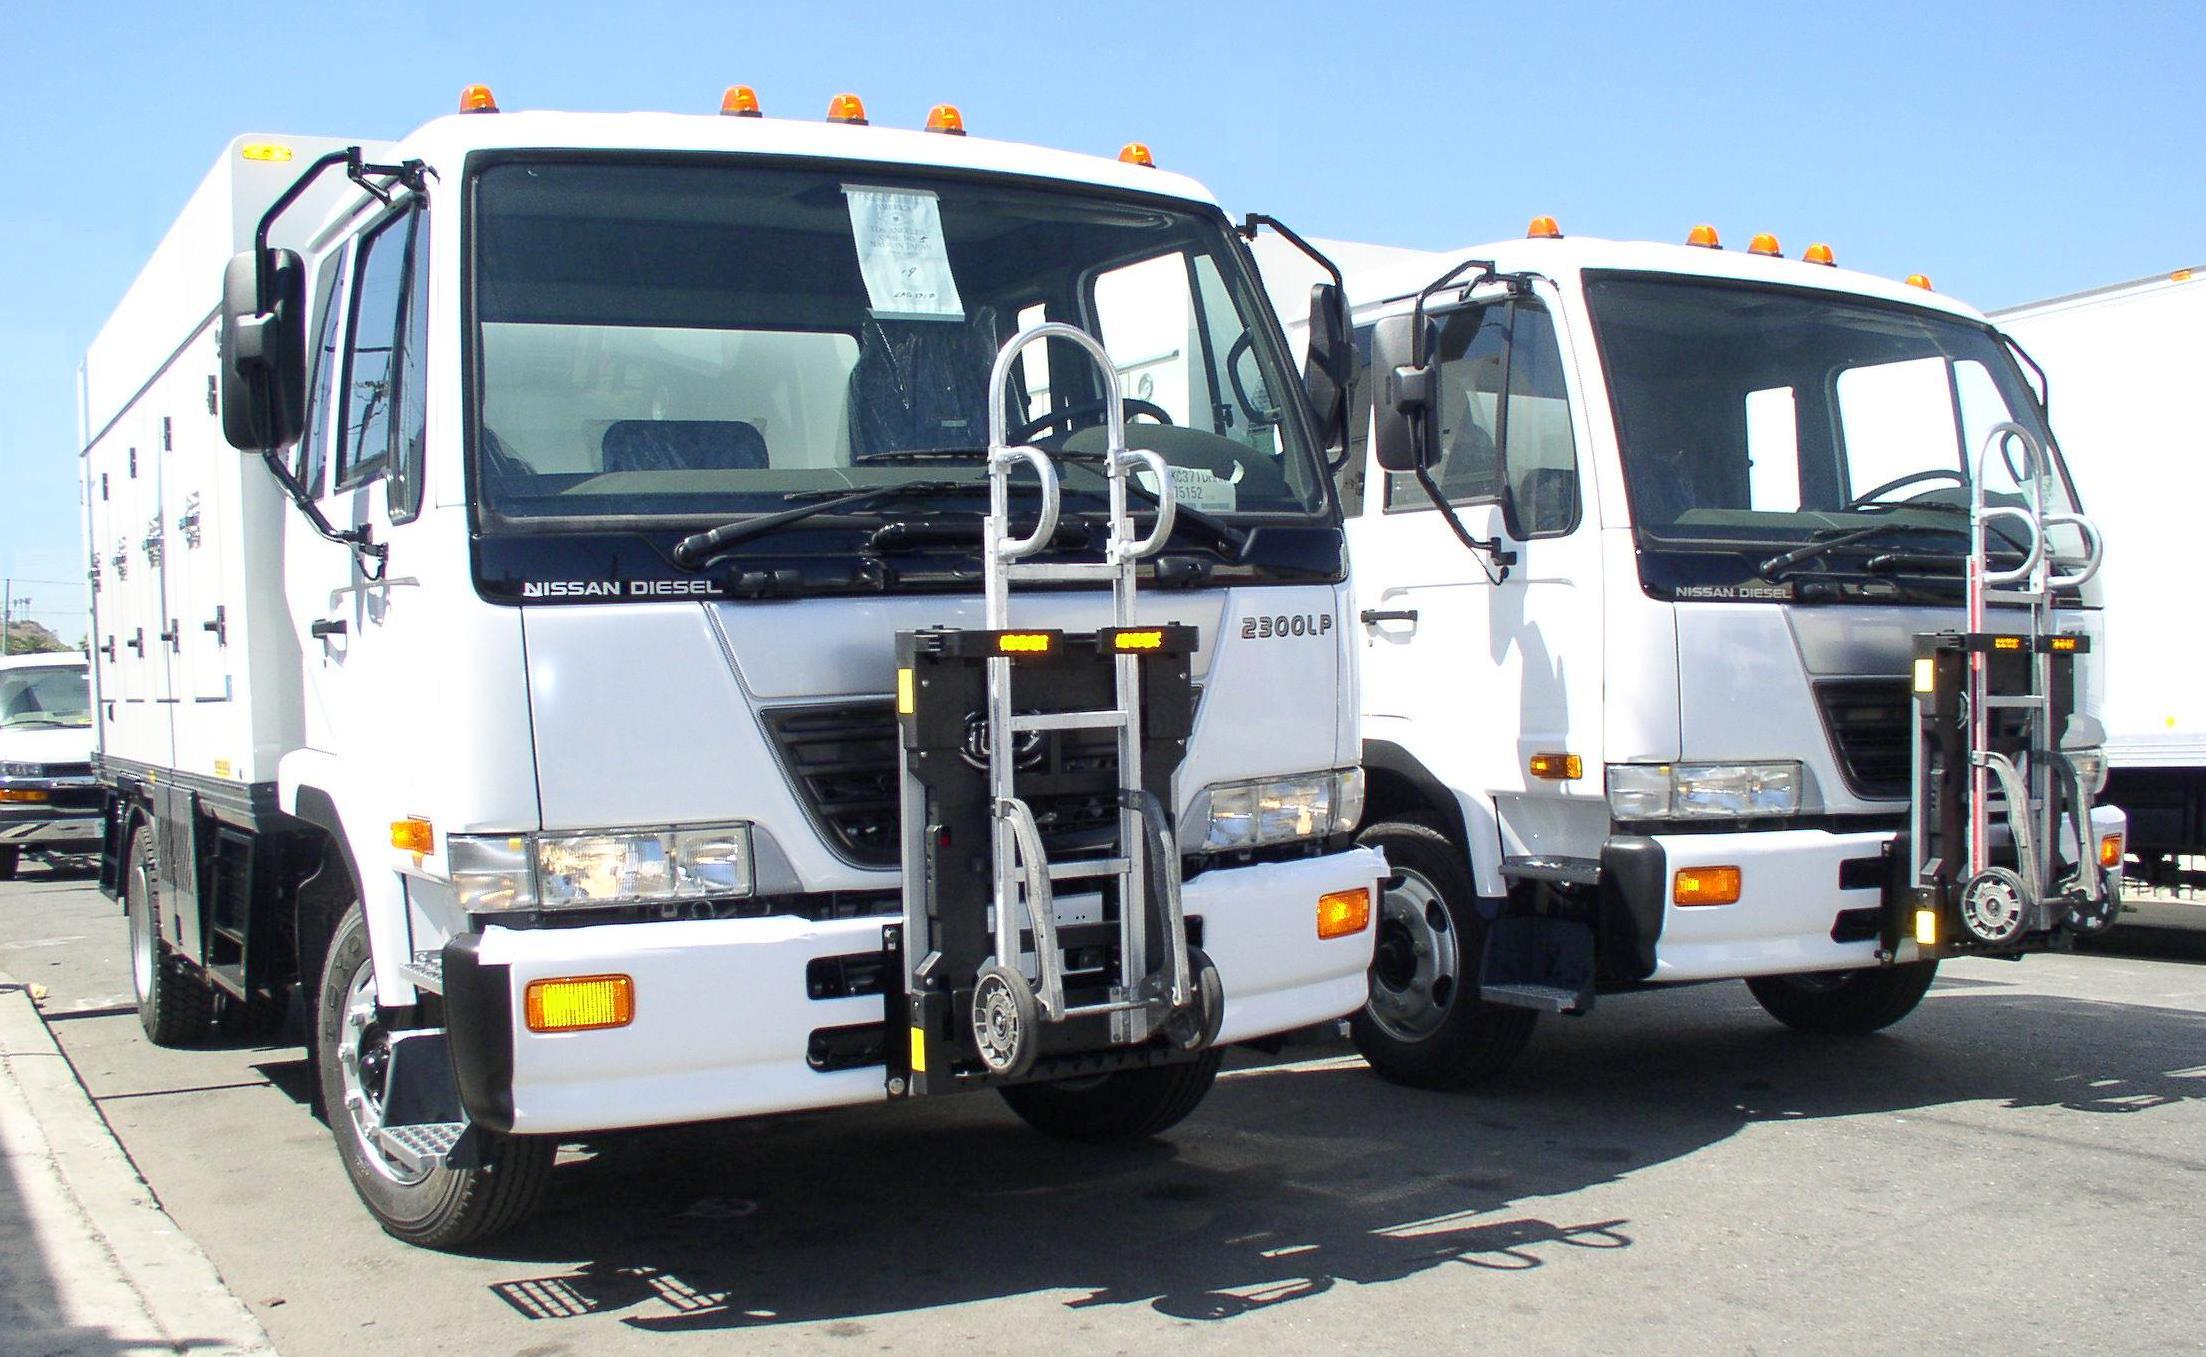 Nissan Diesel Condor Tractor & Construction Plant Wiki